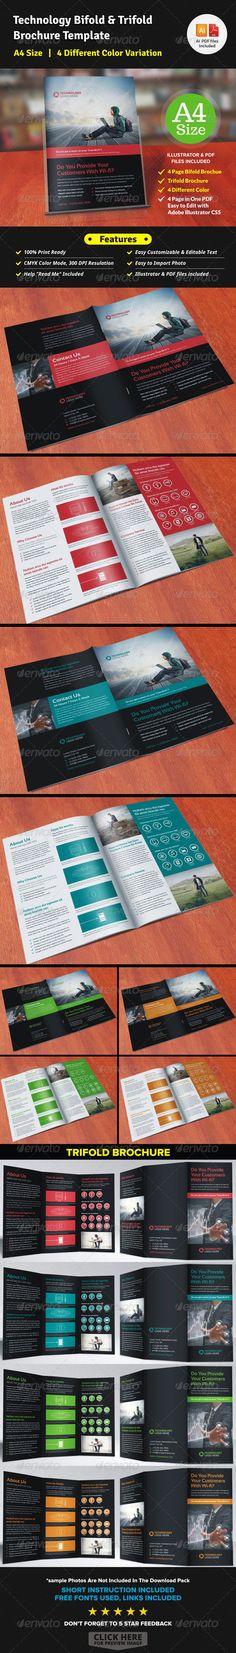 Portfolio Trifold Brochure Indesign Template Indesign templates - technology brochure template